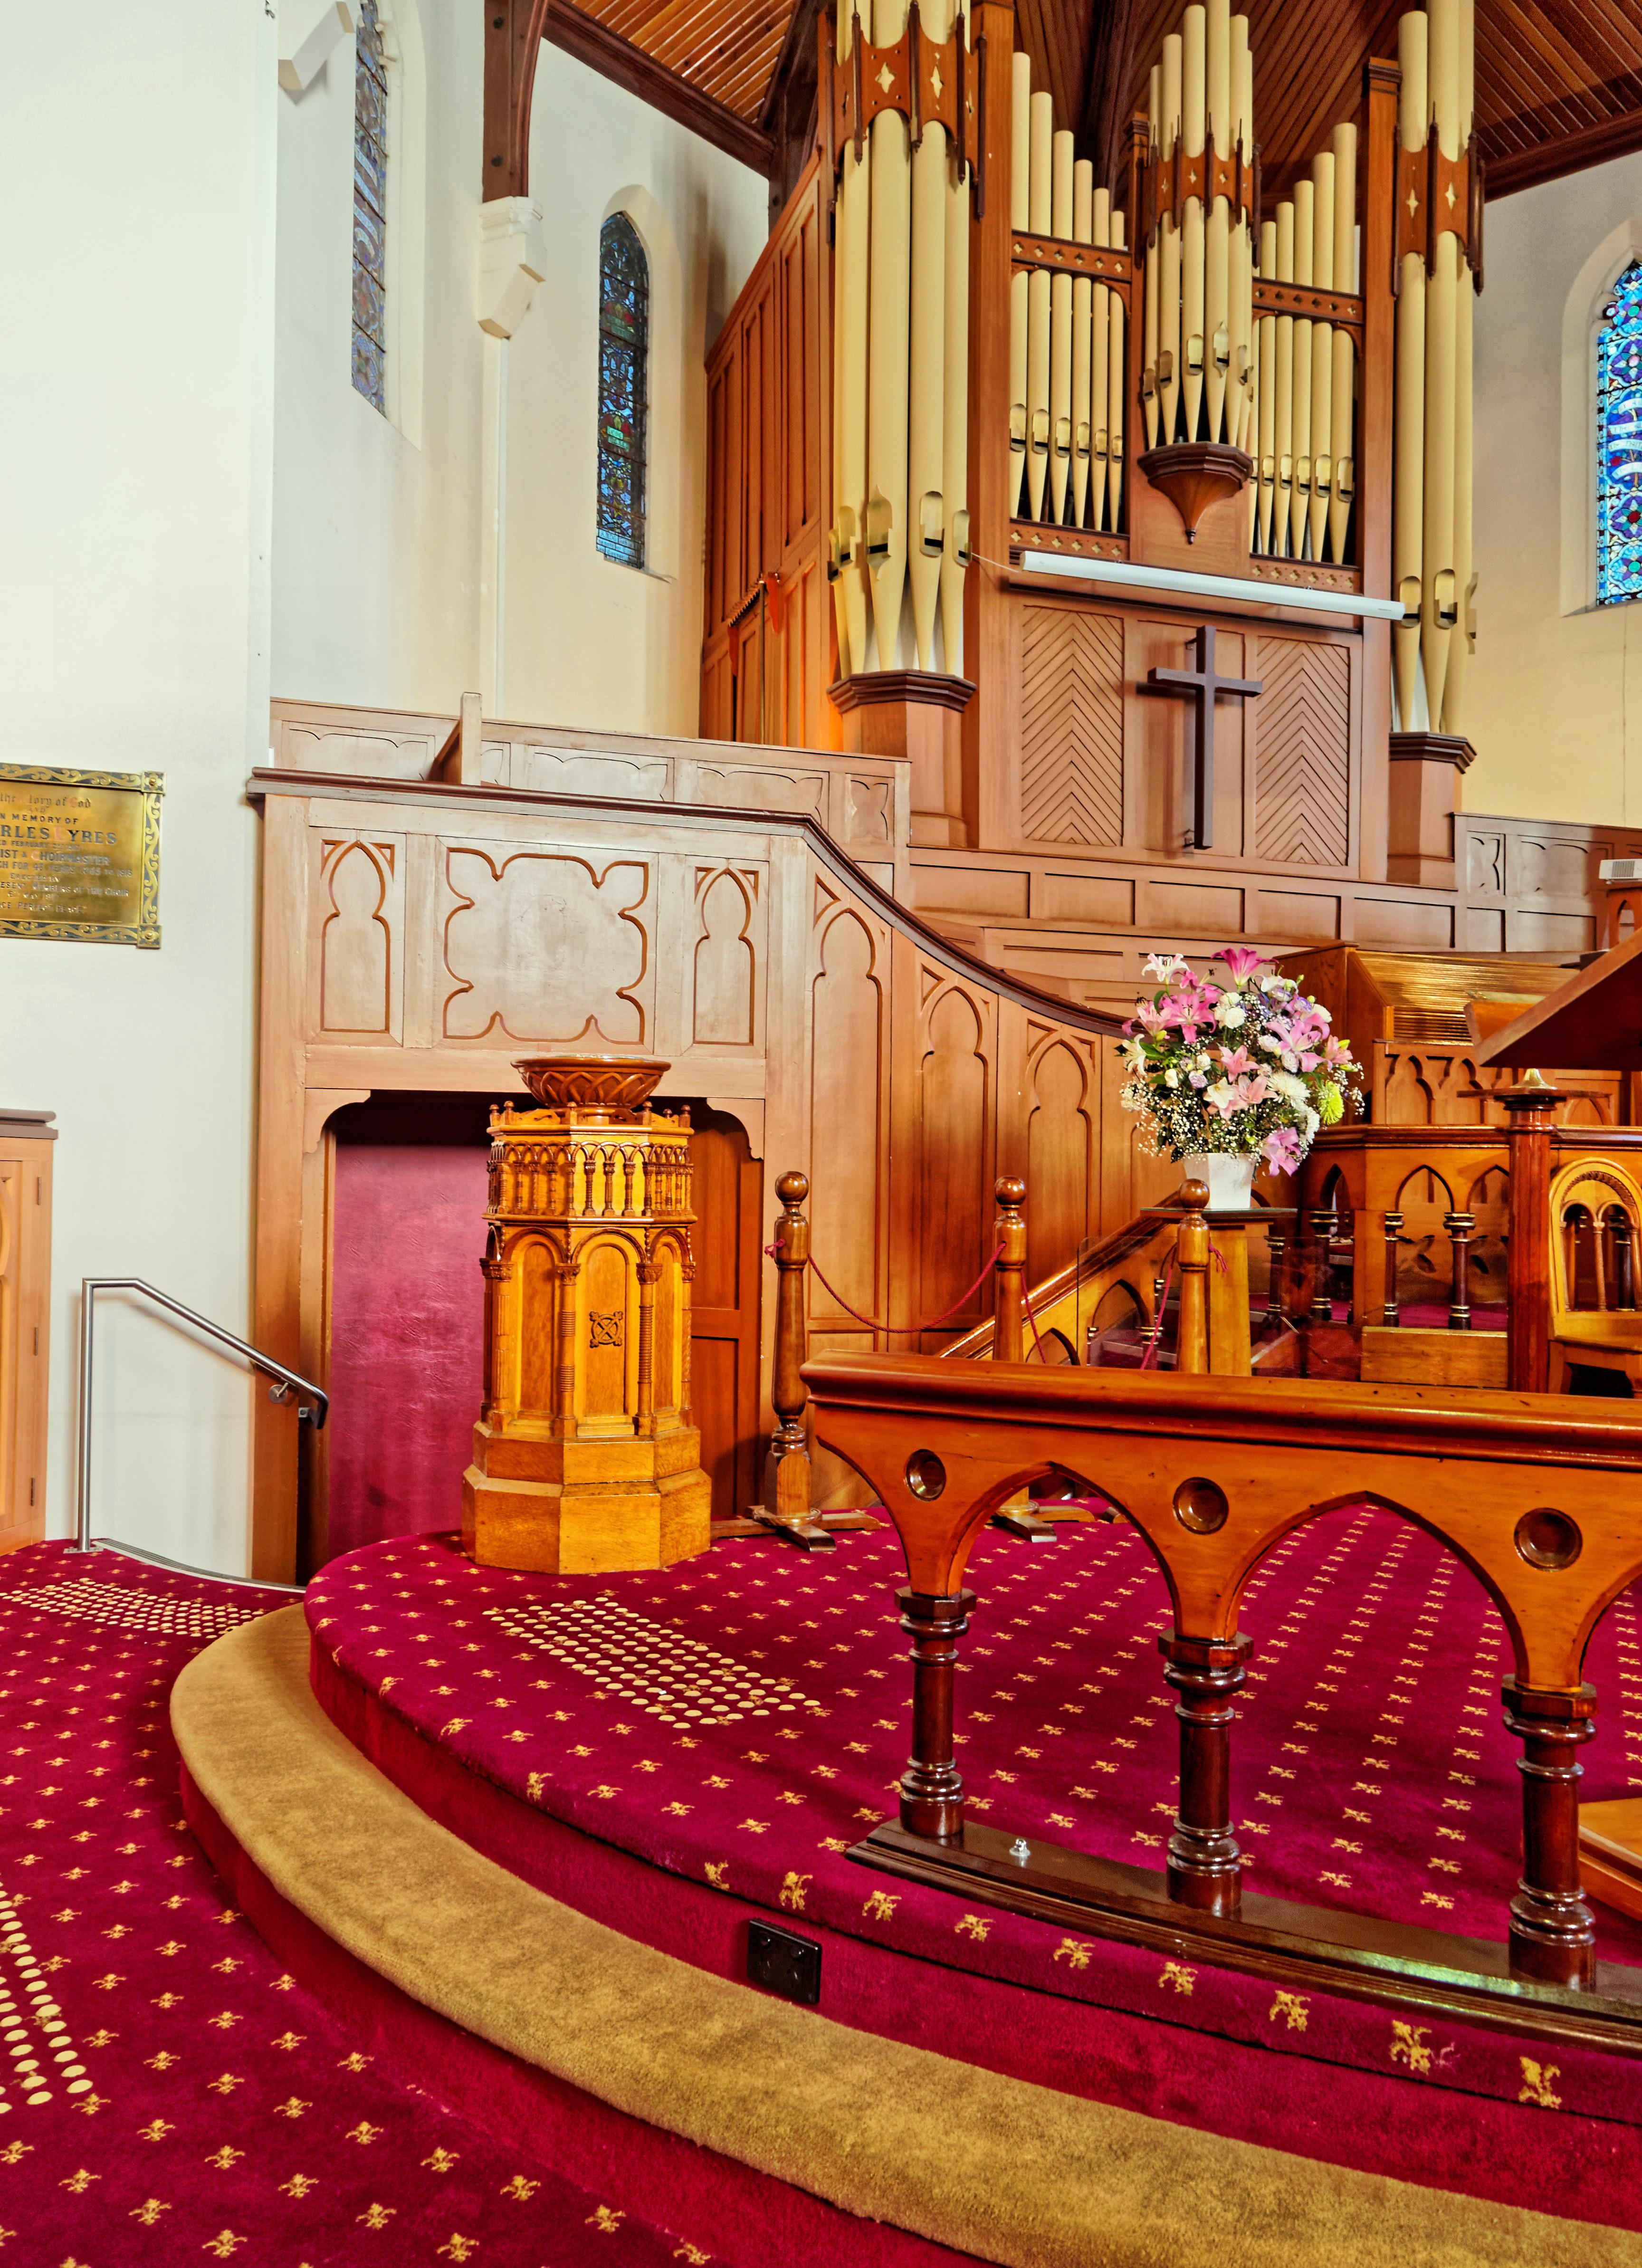 Uniting-church-7.jpeg